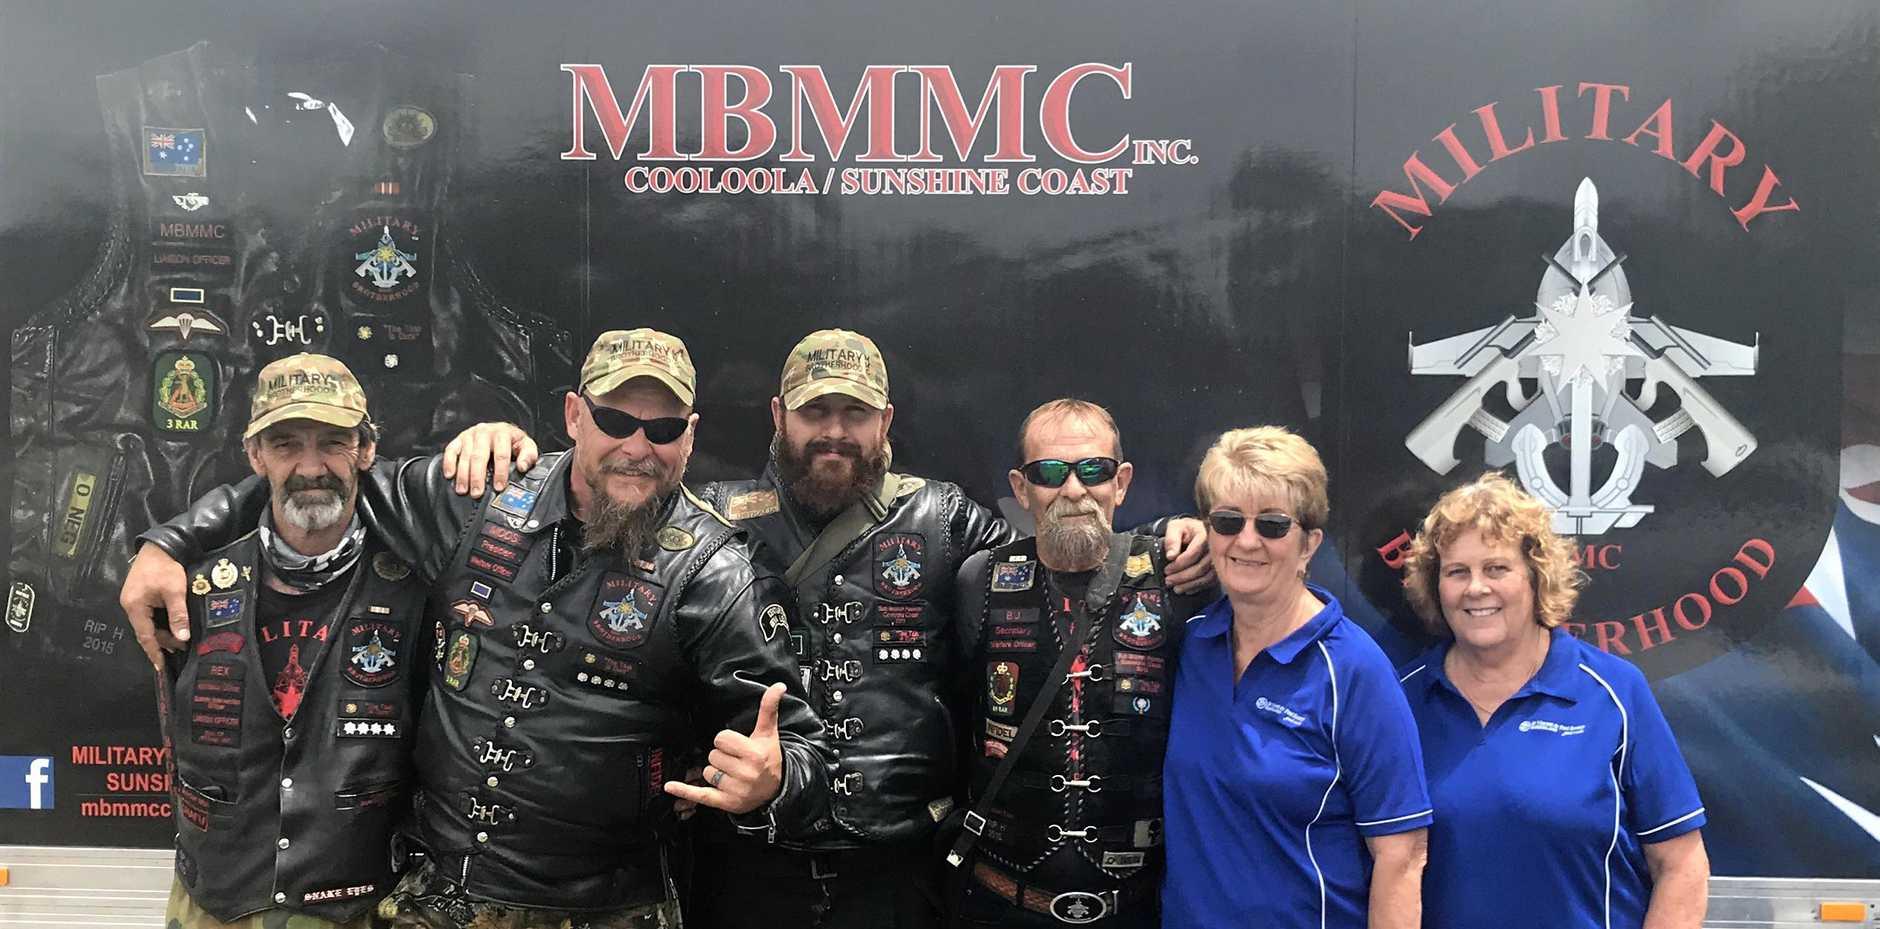 FROM LEFT: Military Brotherhood MMC Cooloola-Sunshine Coast sub branch members Rex Brenneke, Stephen